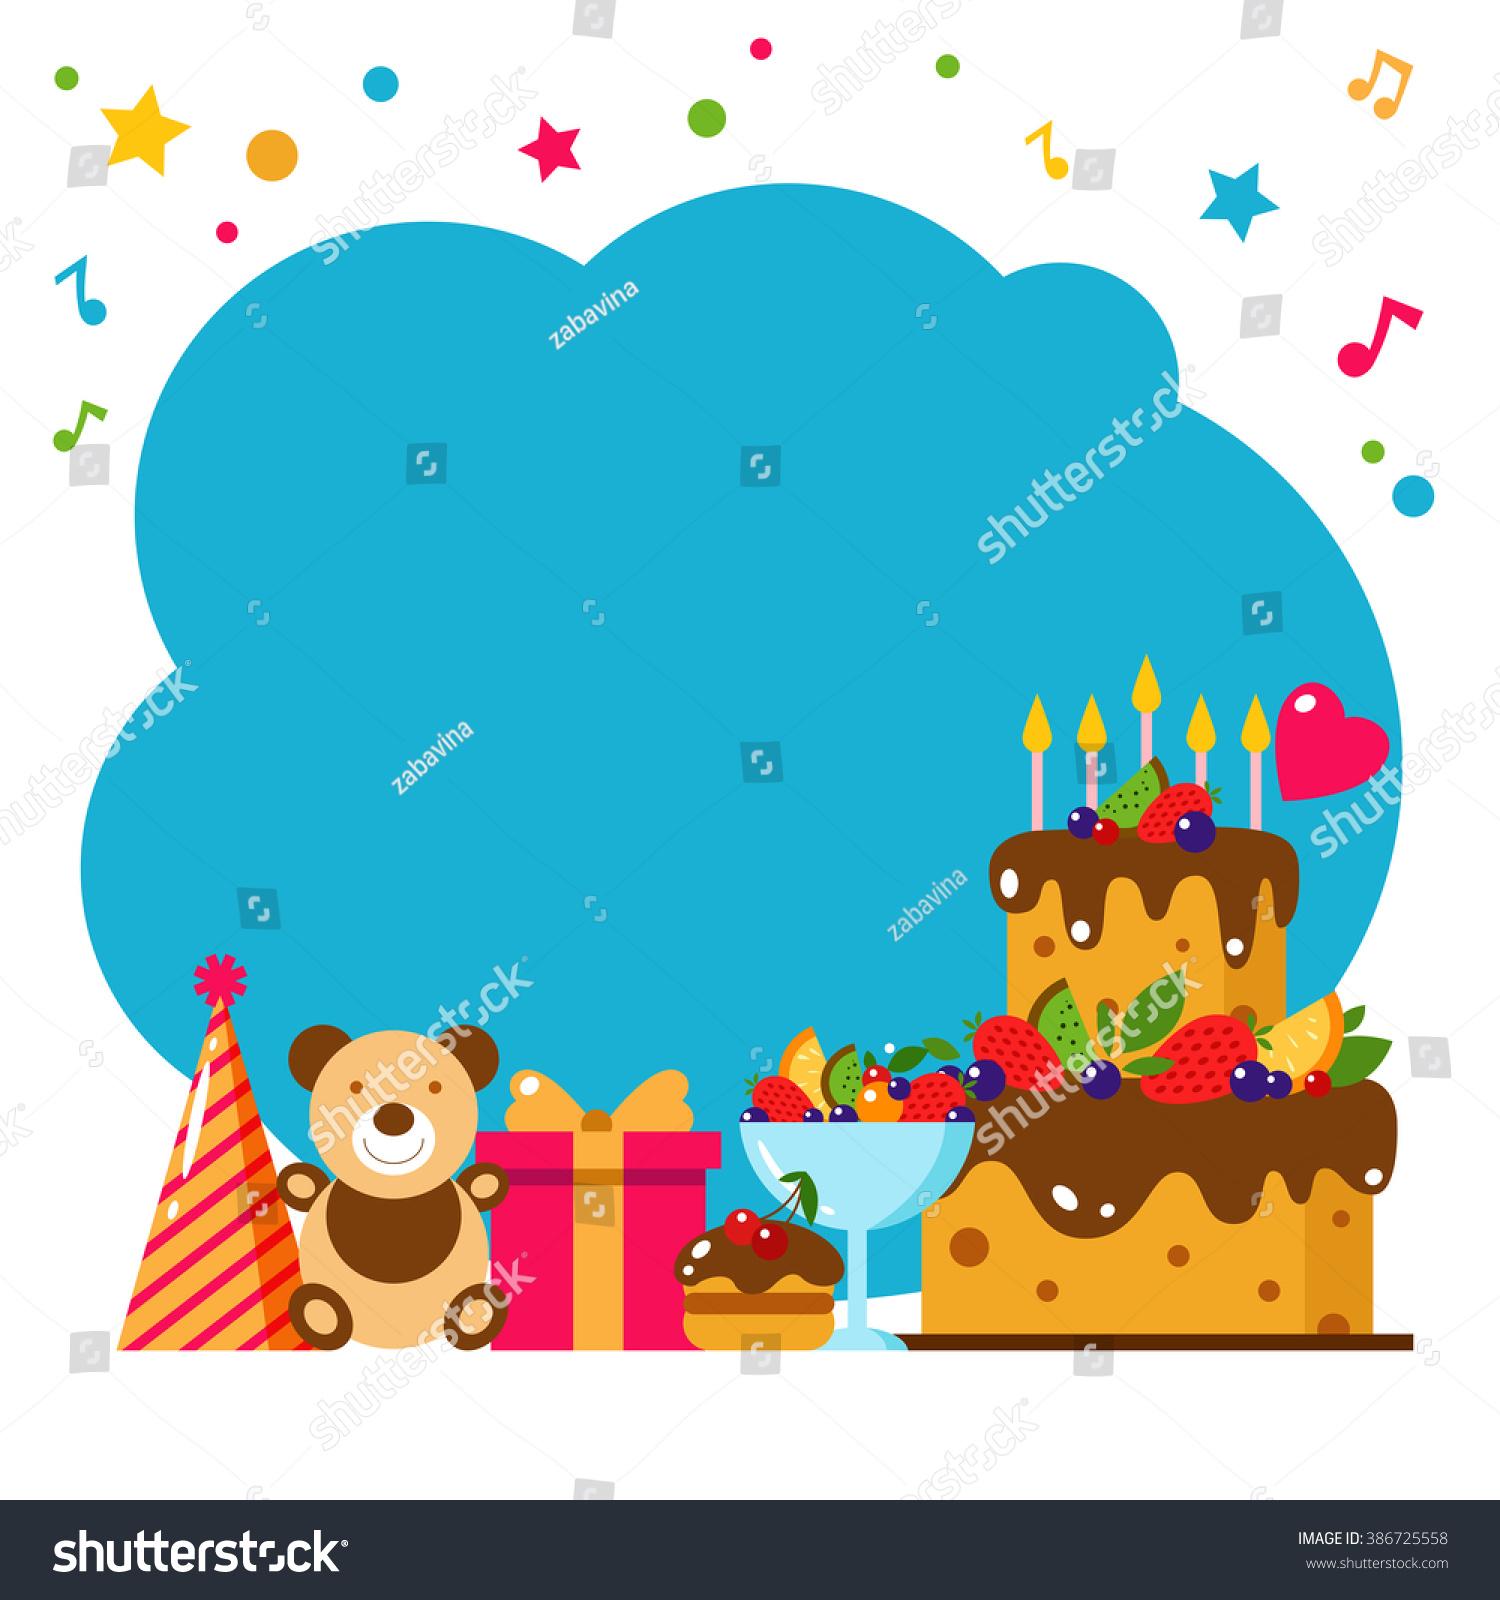 Happy Birthday Card Flat Vector Illustration Kids Party Design Elements Frame Invitation